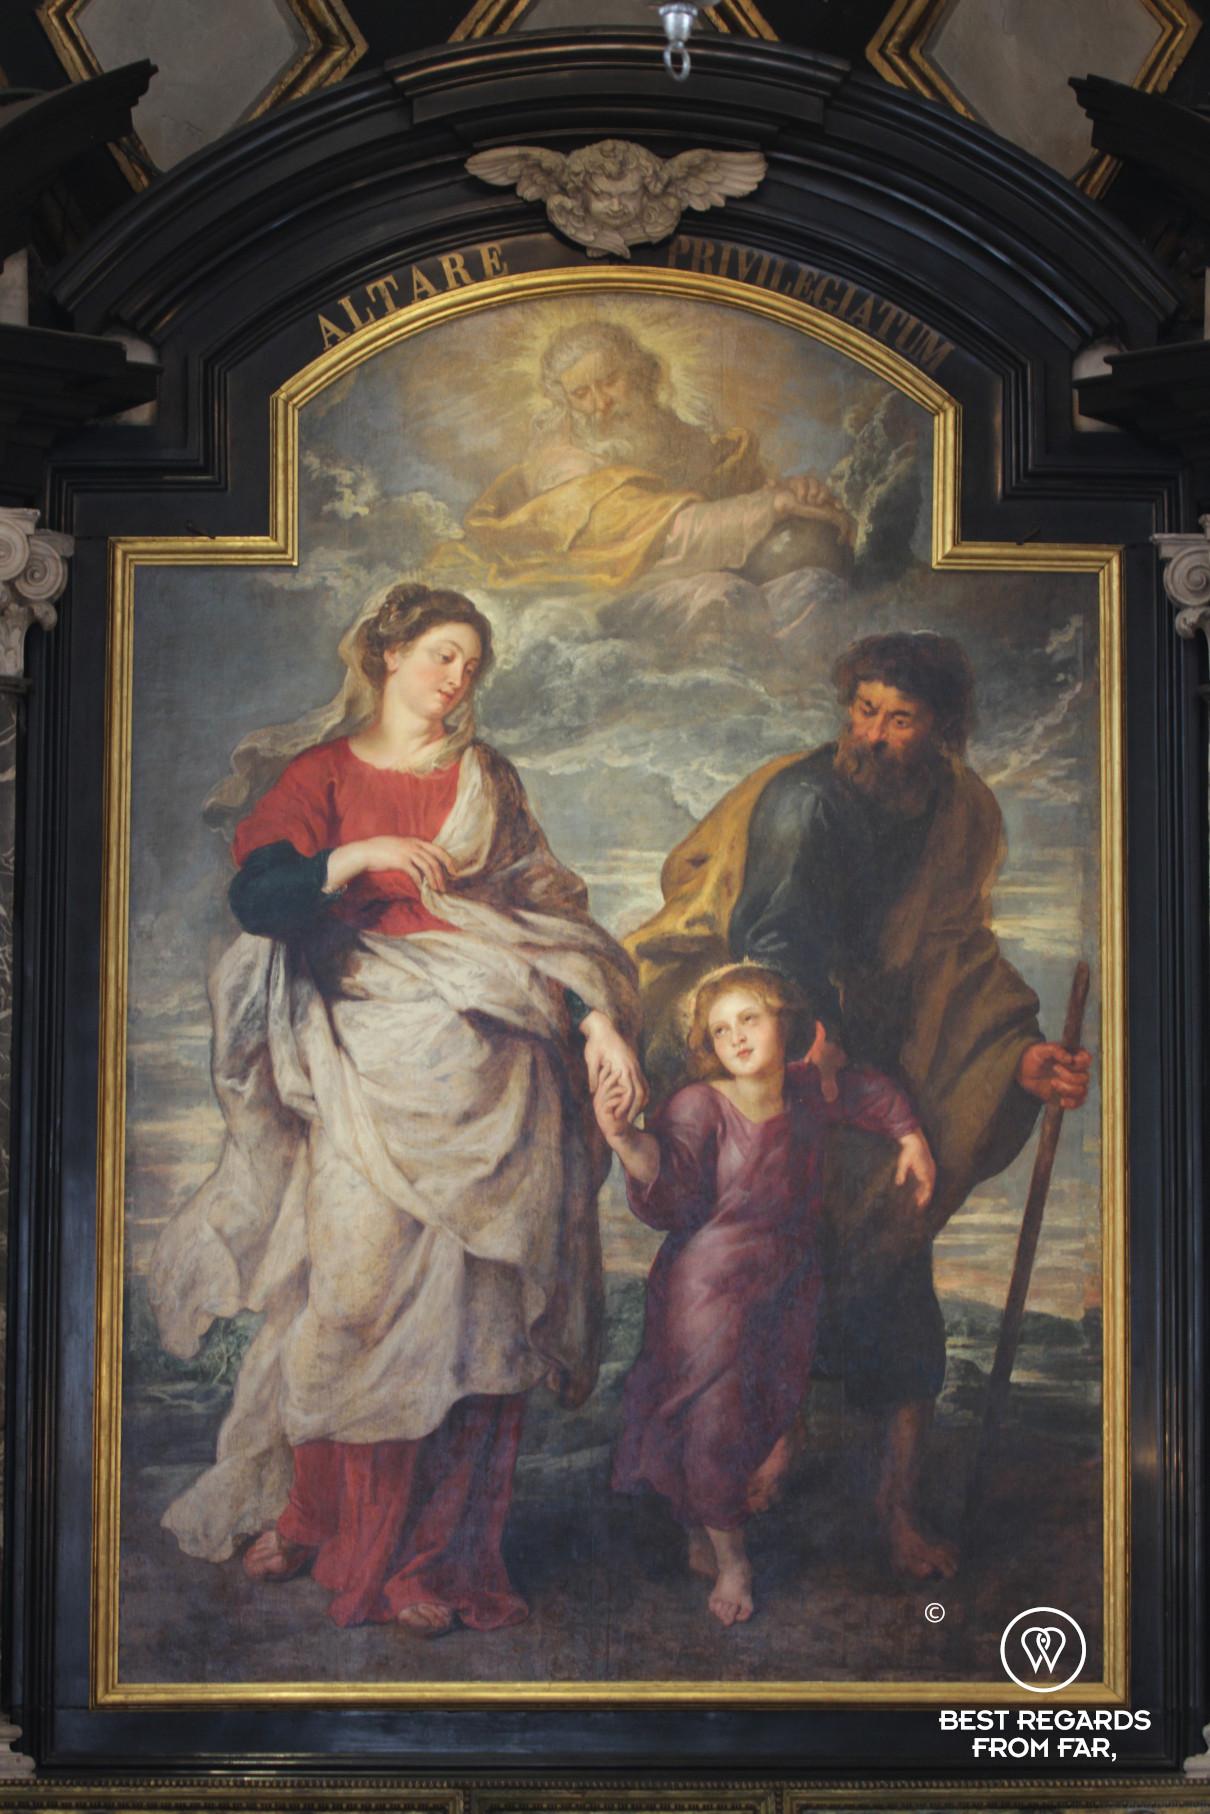 The Return of the Holy Family (1624) by Rubens, Saint Charles Borromeo Church, Antwerp